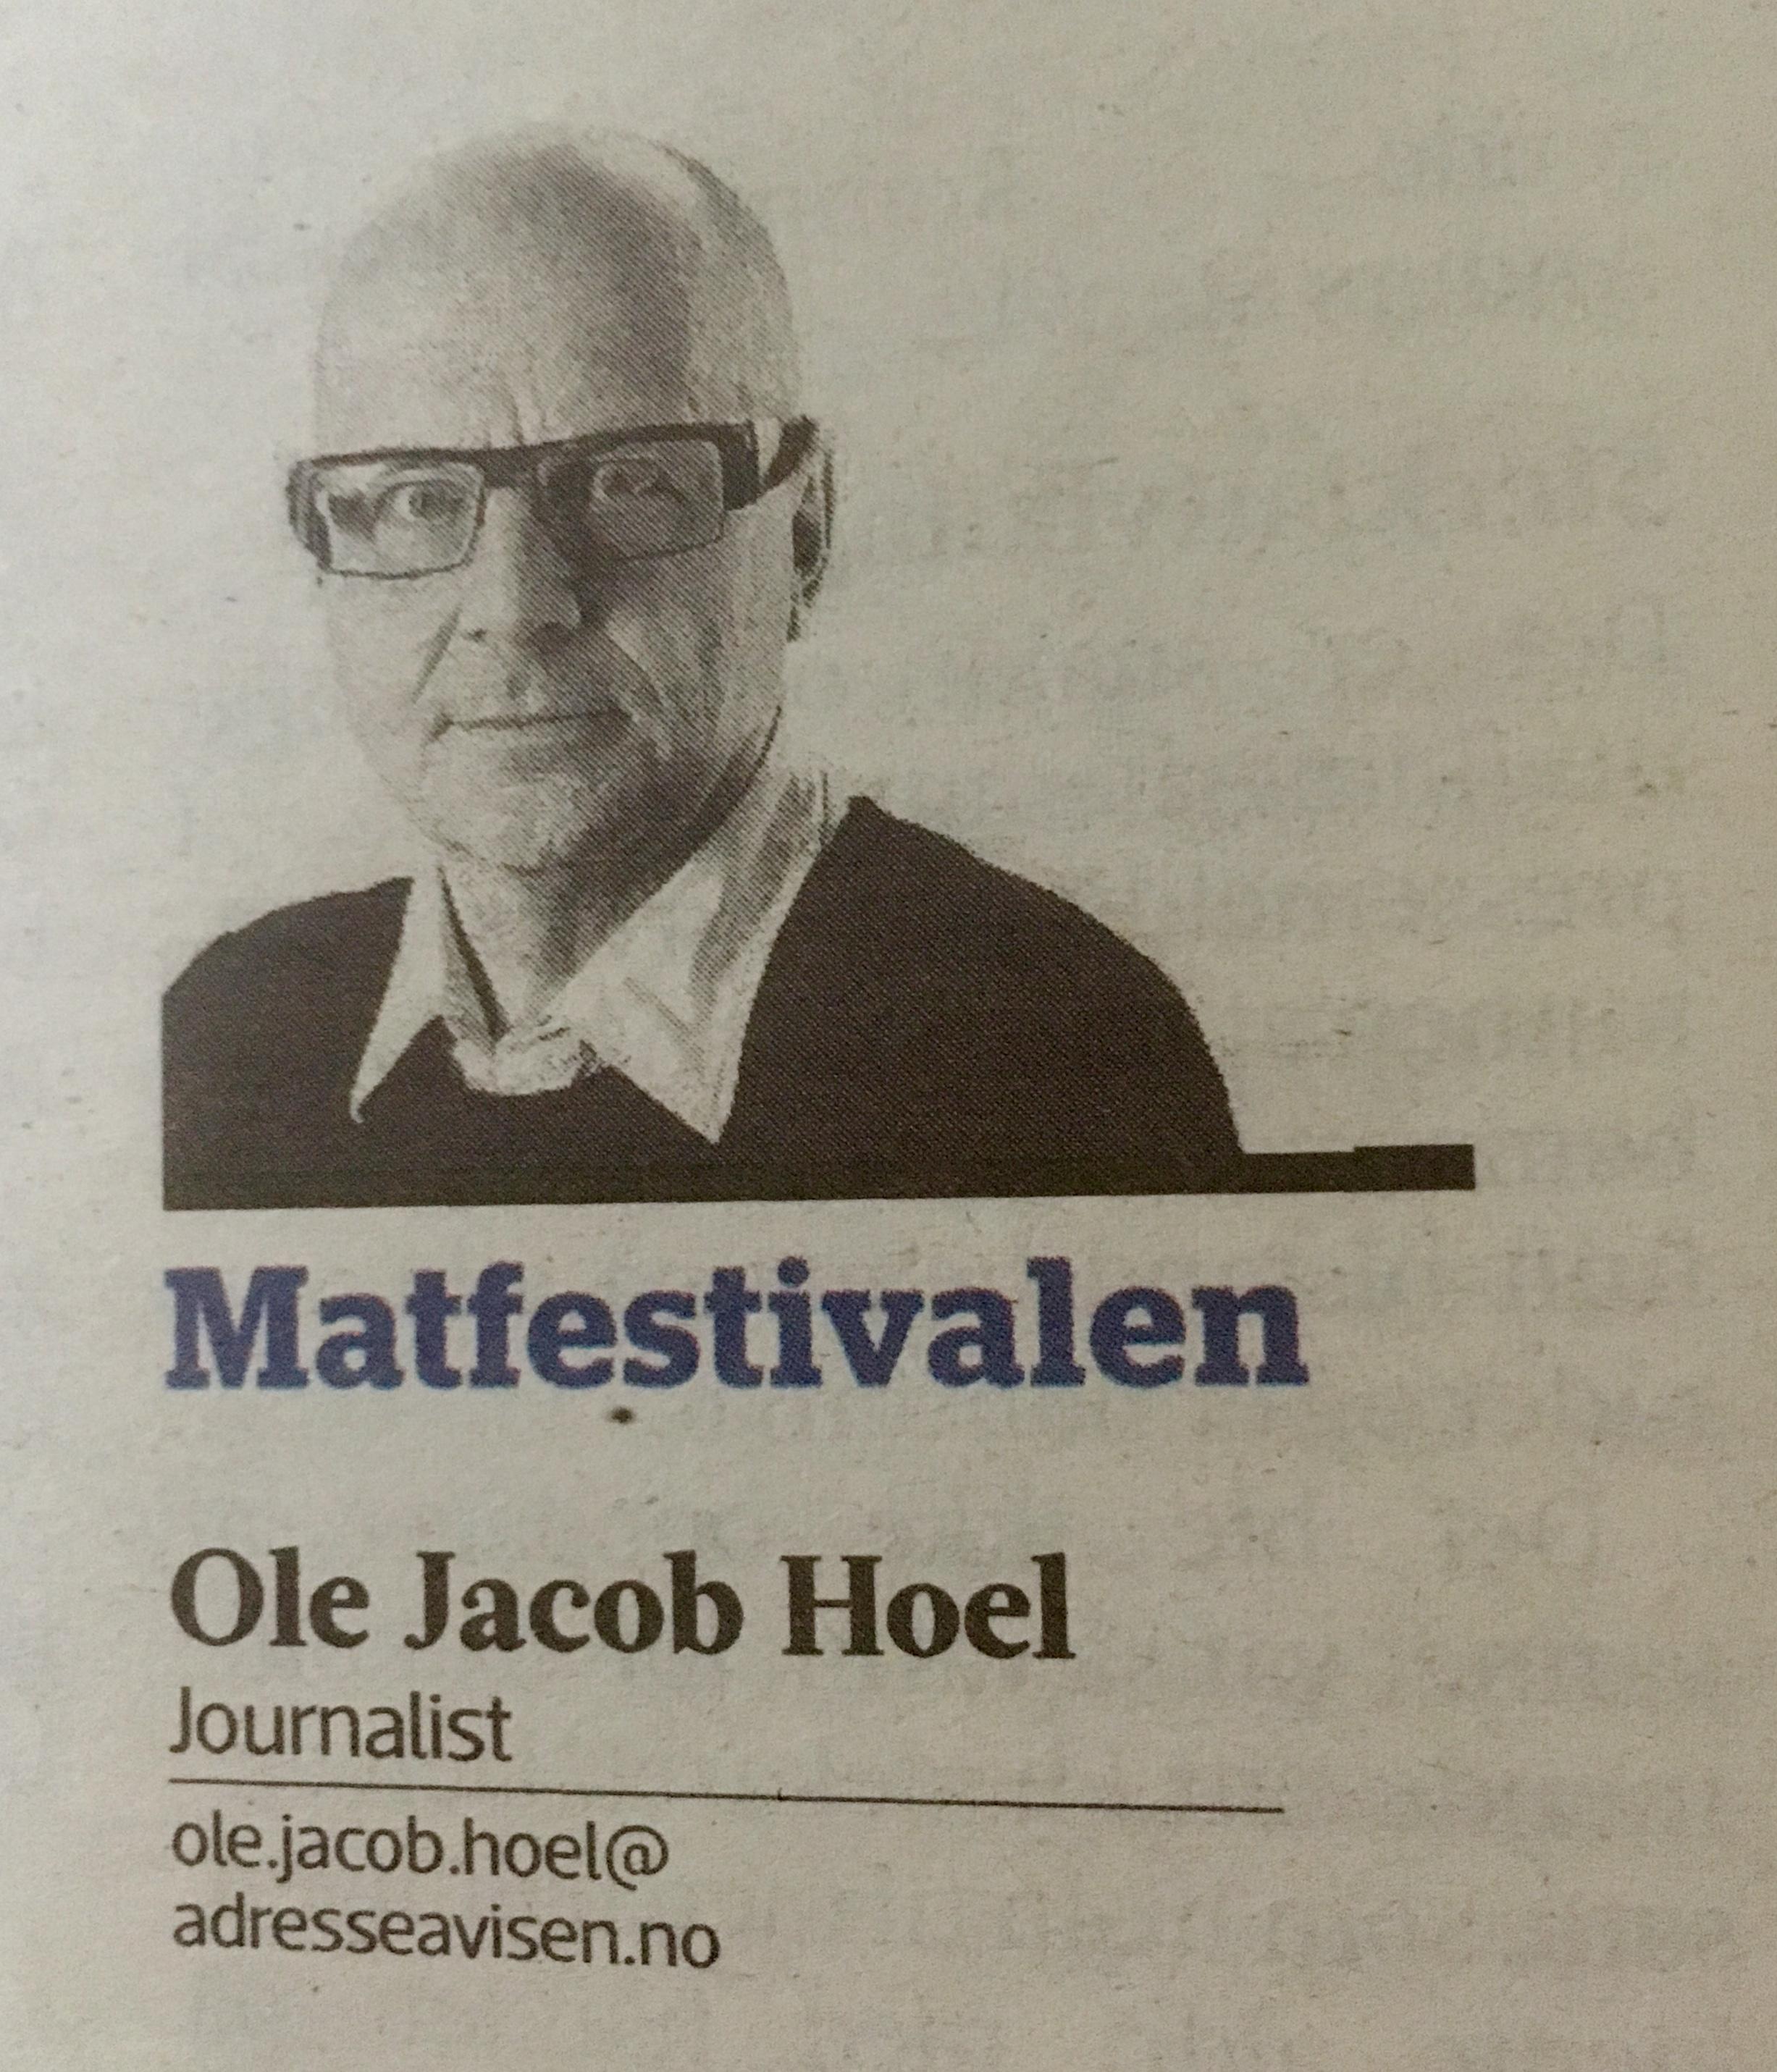 Ole Jacob Hoel_matfestivalen_bortistu.jpg